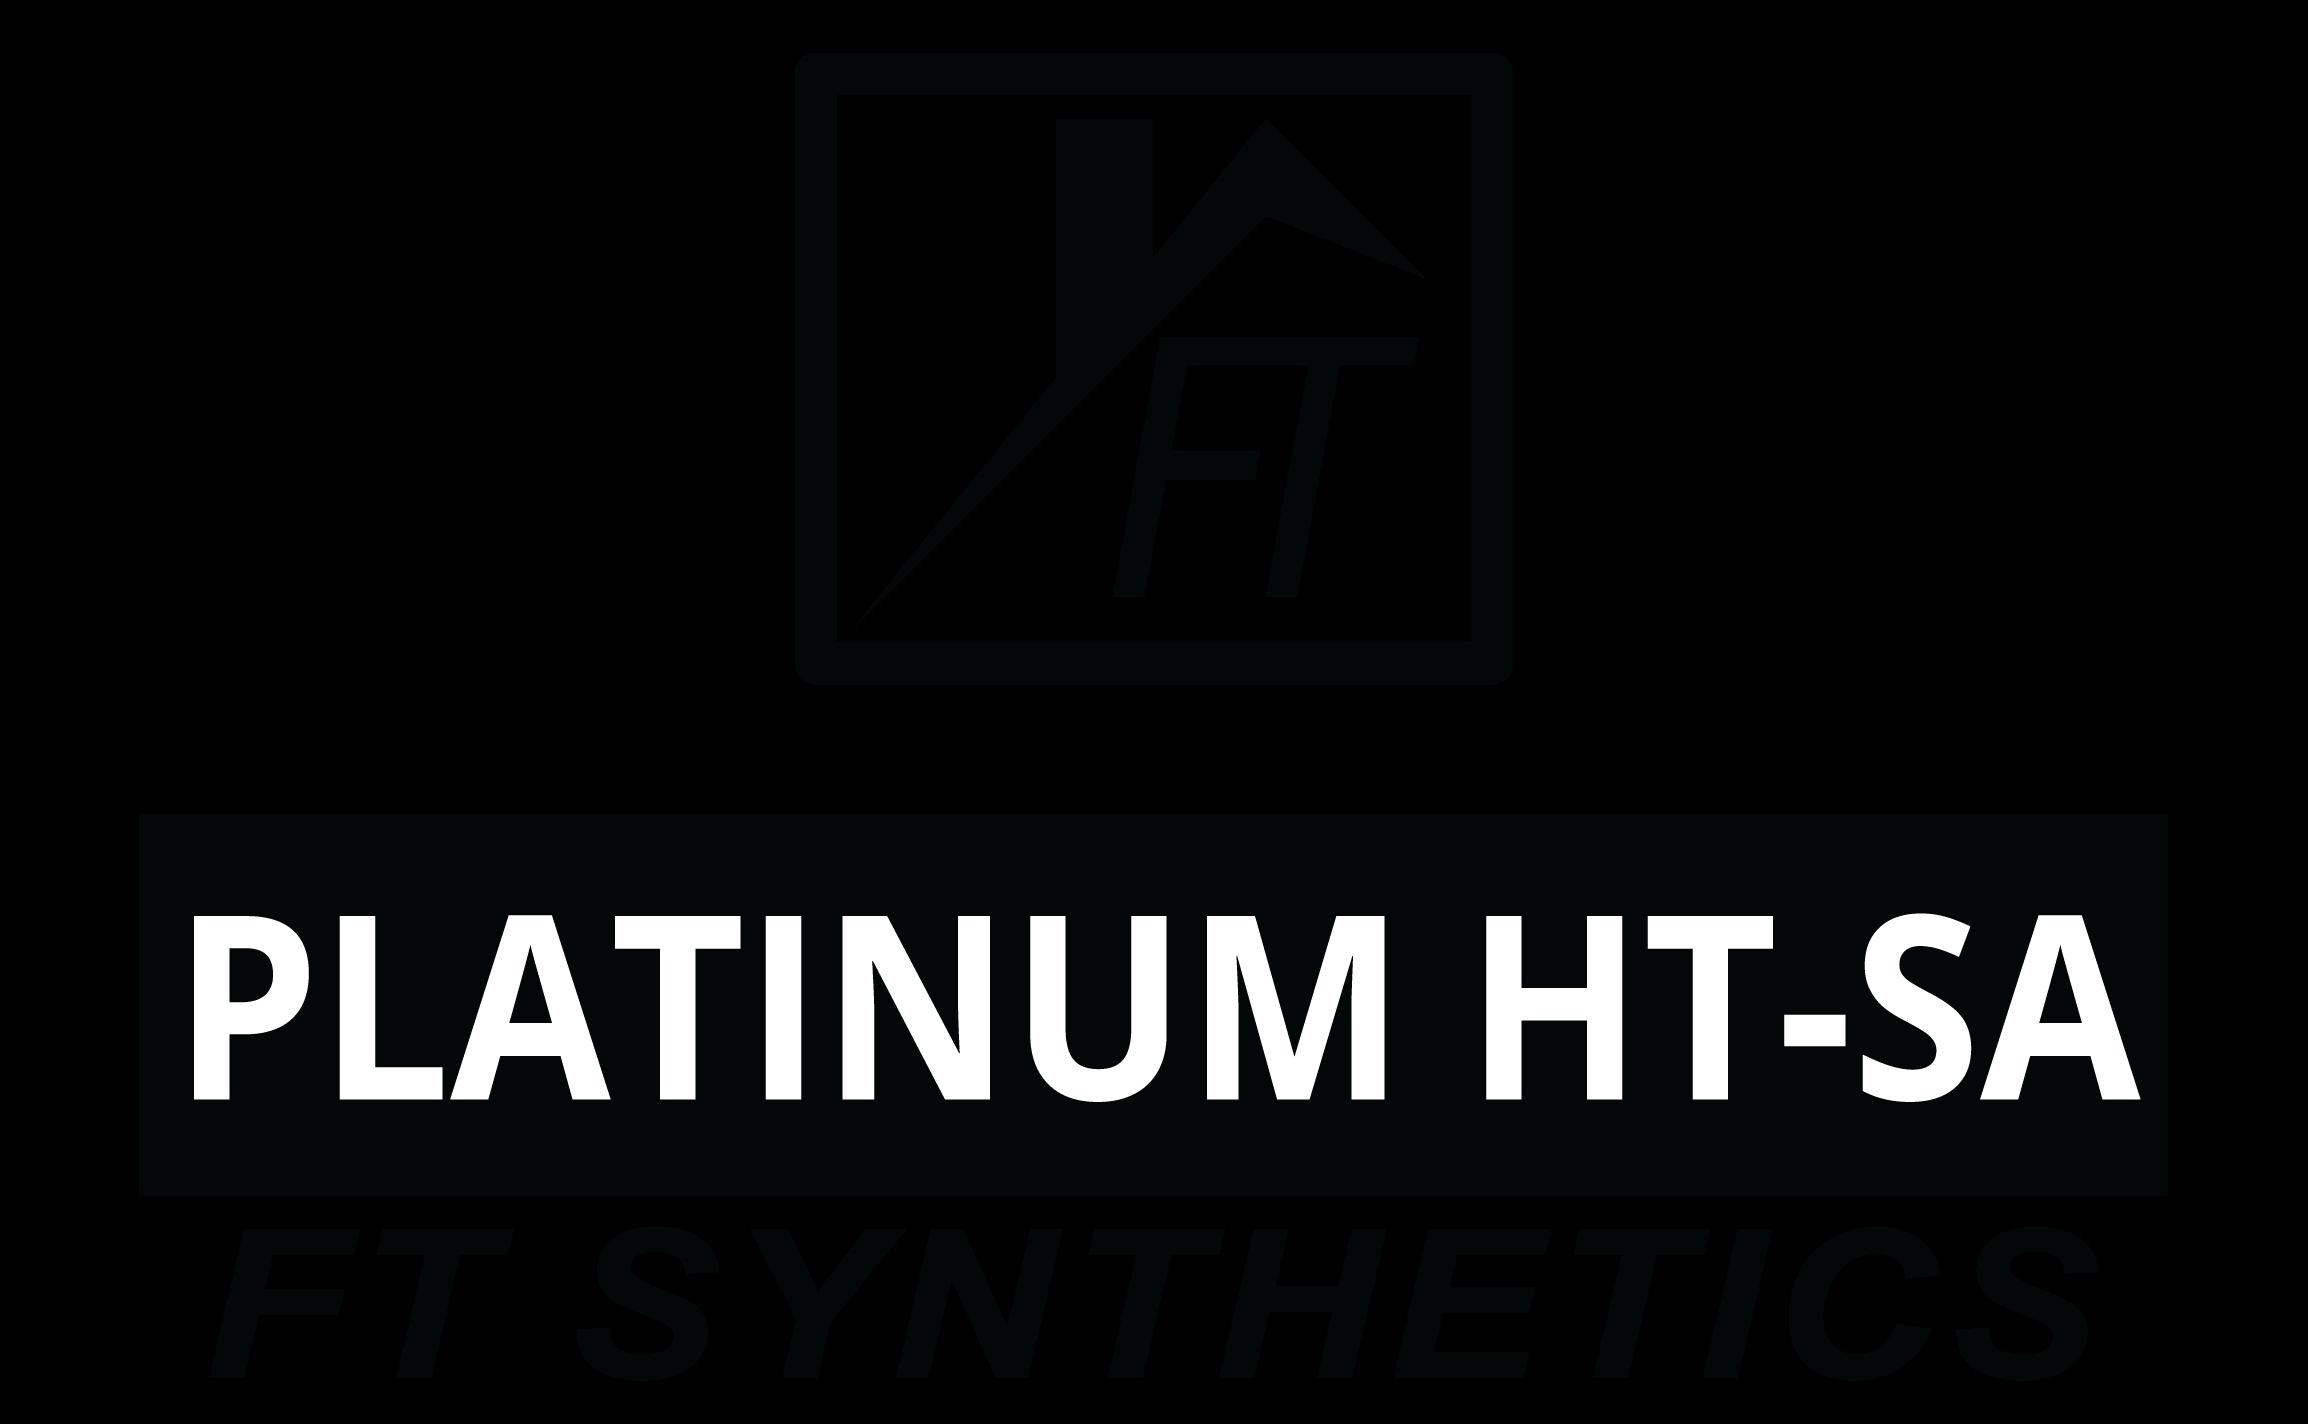 FT-platinum-htsa-logo-lrg-black